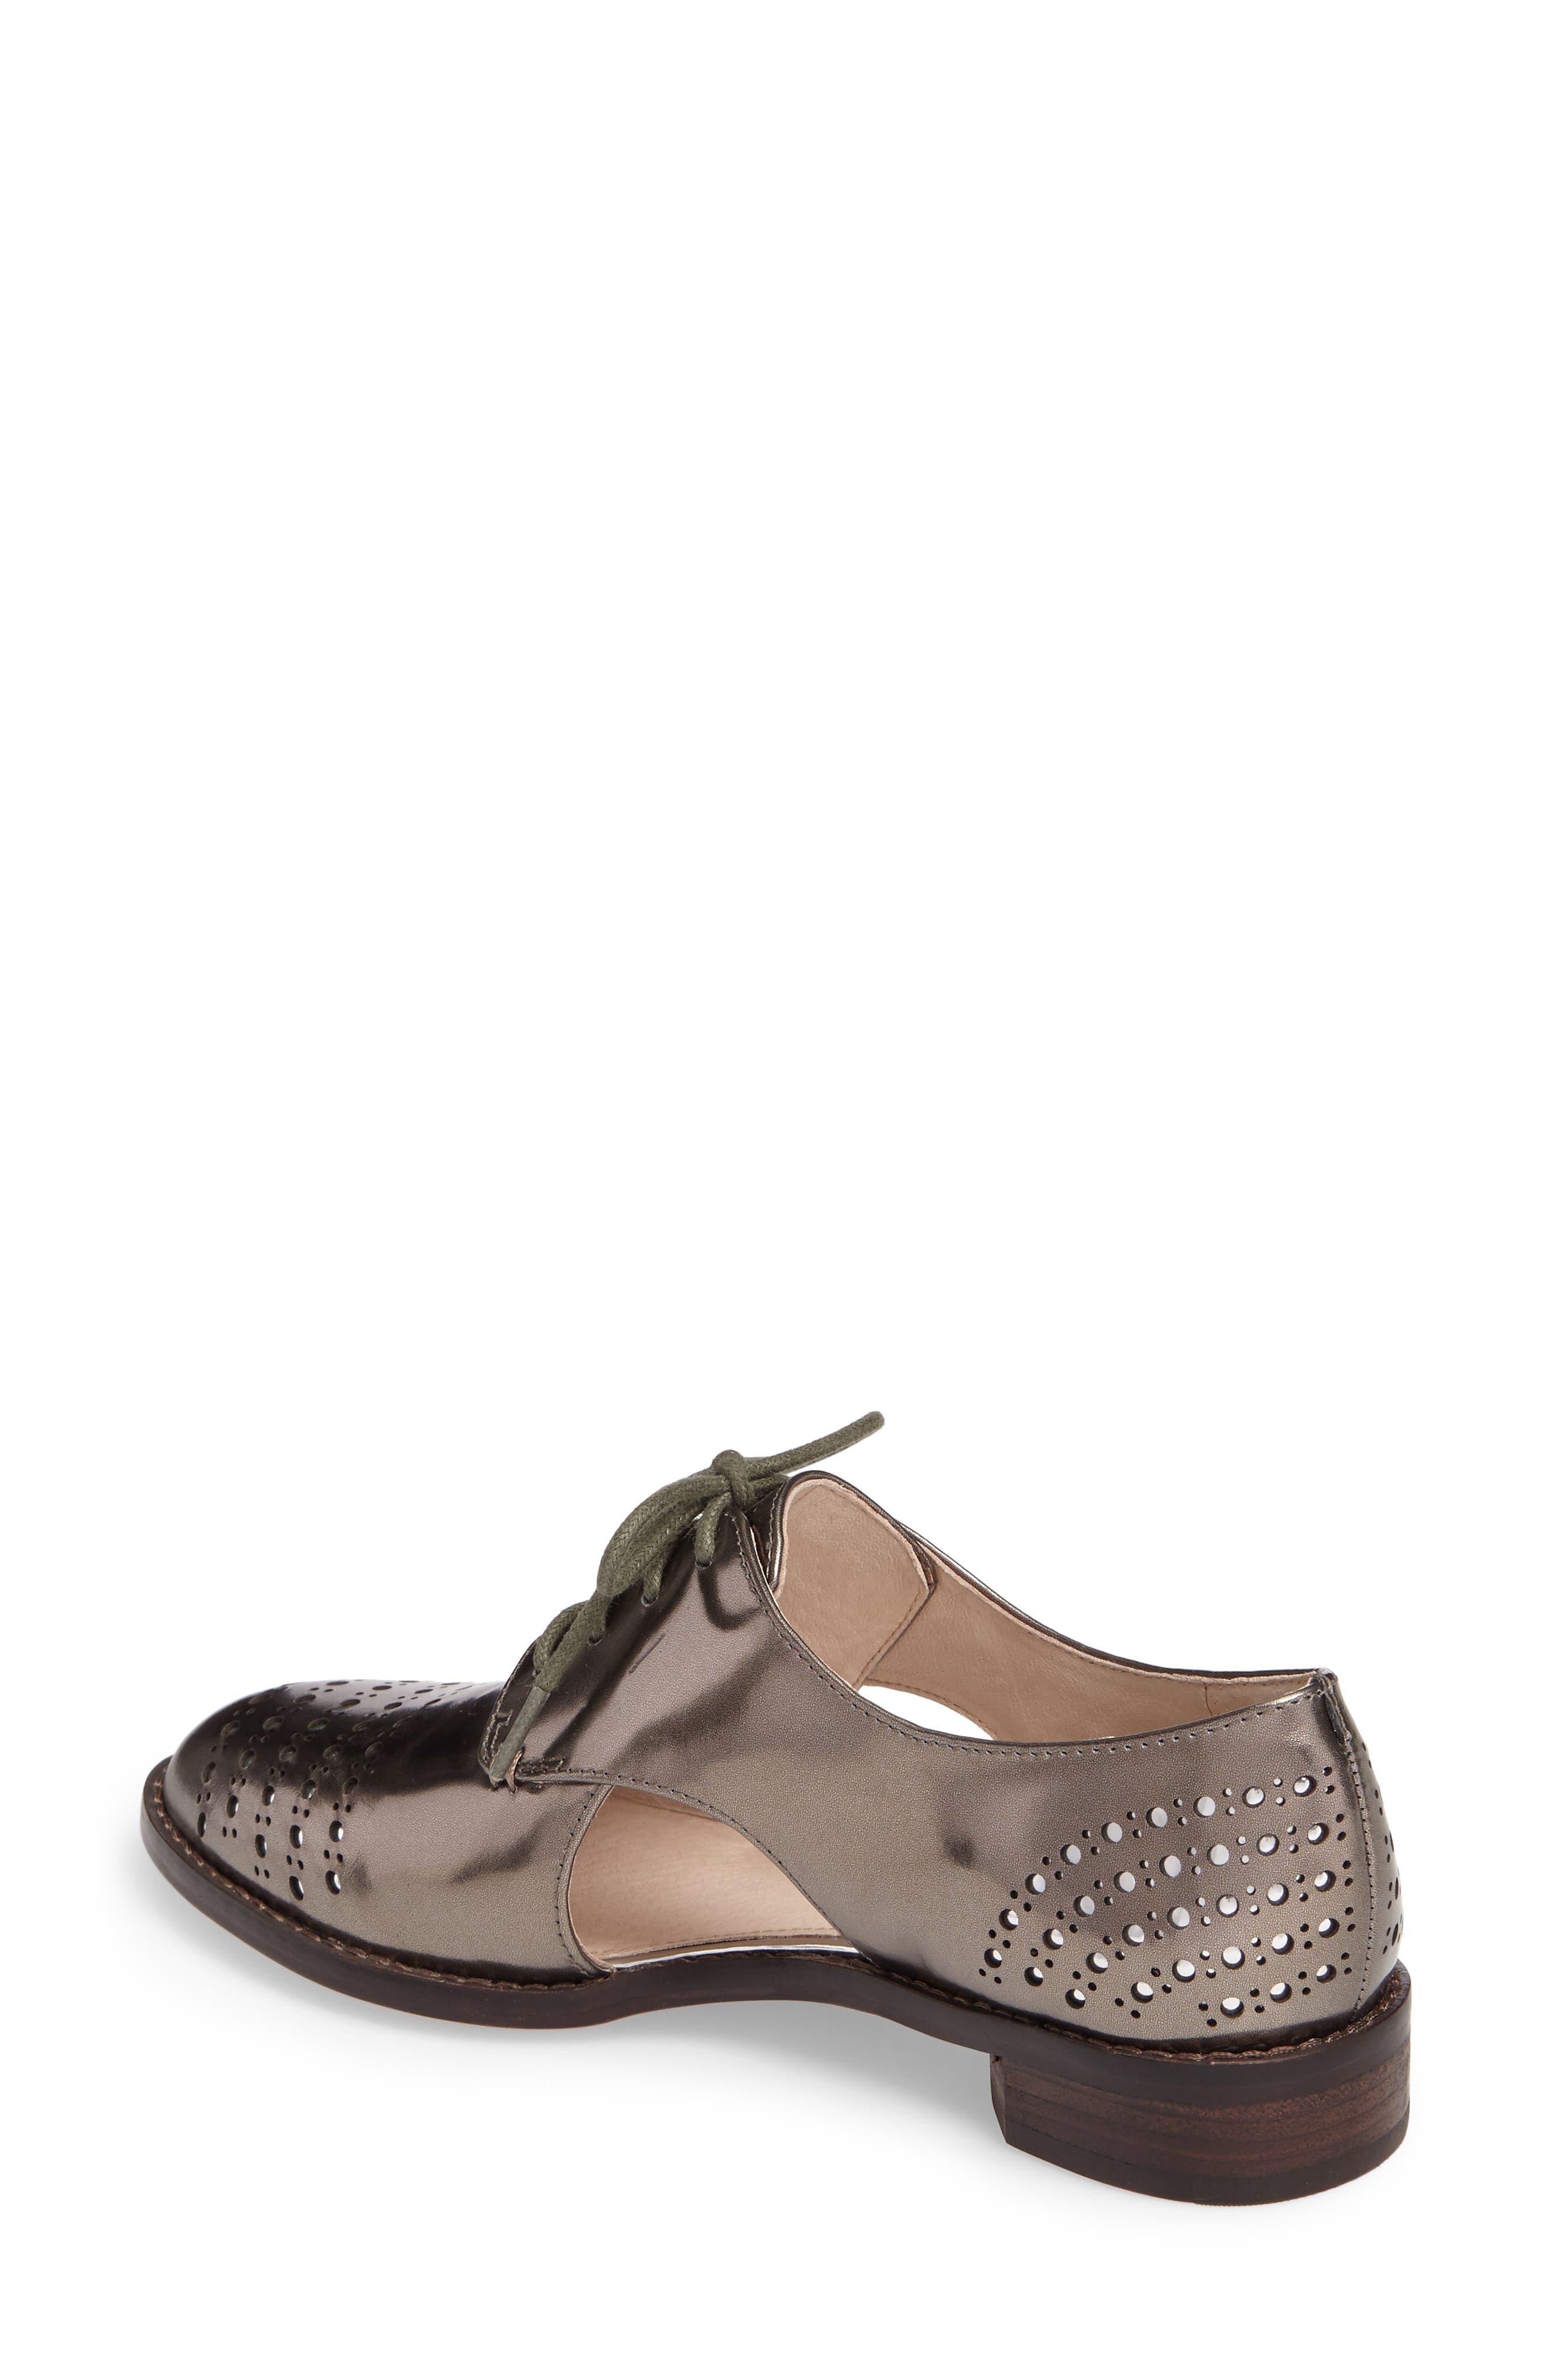 Felta Cutout Oxford,                             Alternate thumbnail 2, color,                             Iron Specchio Leather